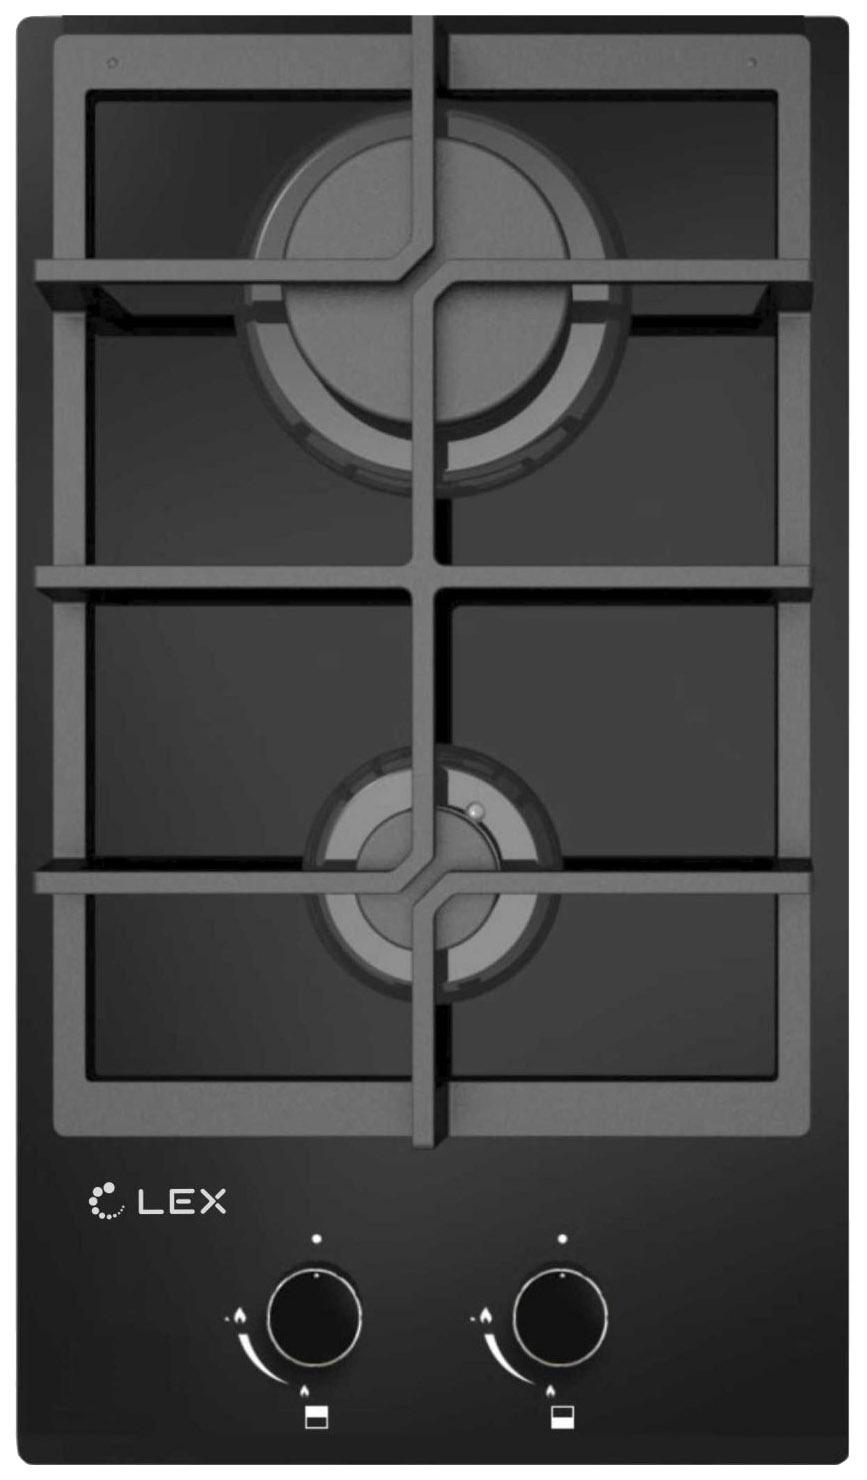 Встраиваемая варочная панель газовая LEX GVG 321 BL Black